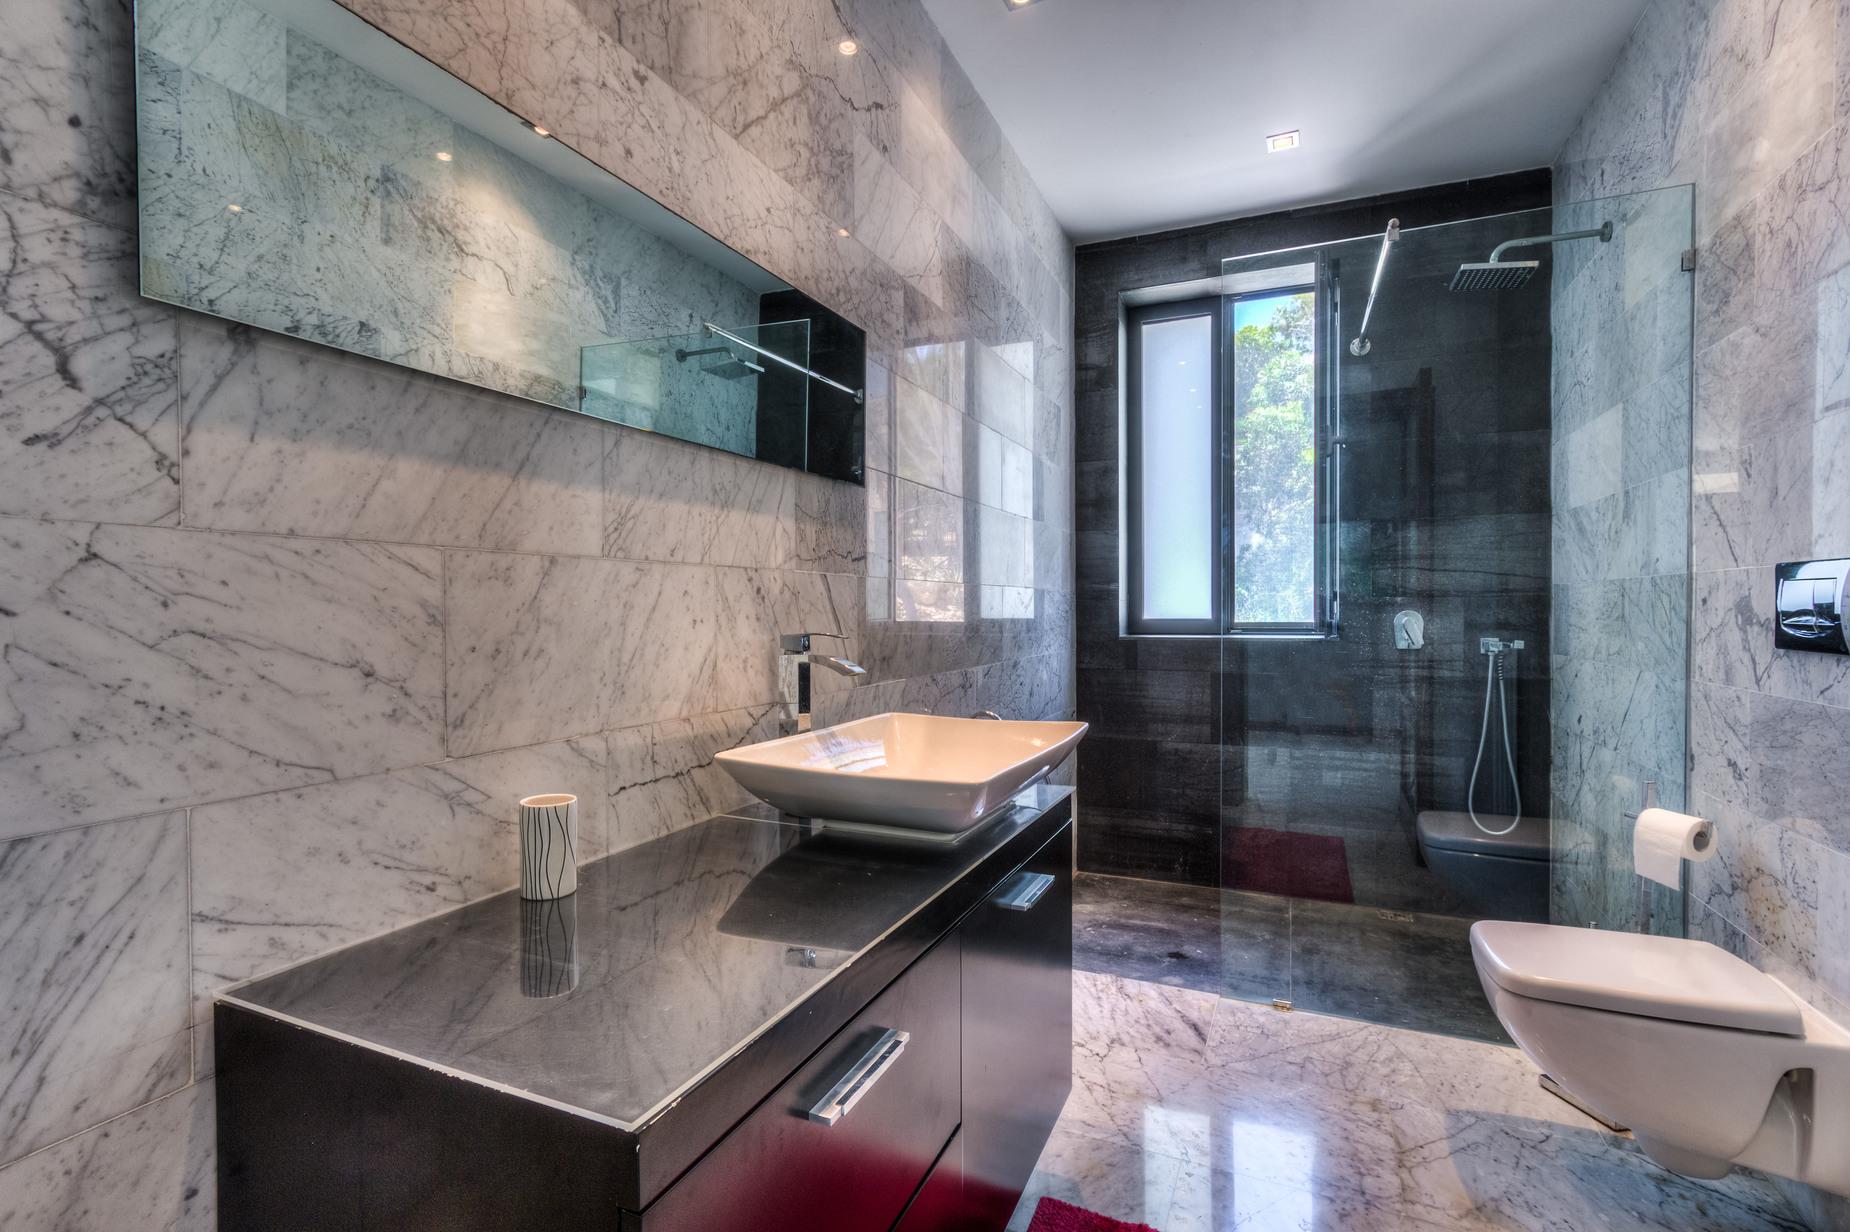 6 bed Villa For Rent in Mellieha, Mellieha - thumb 13